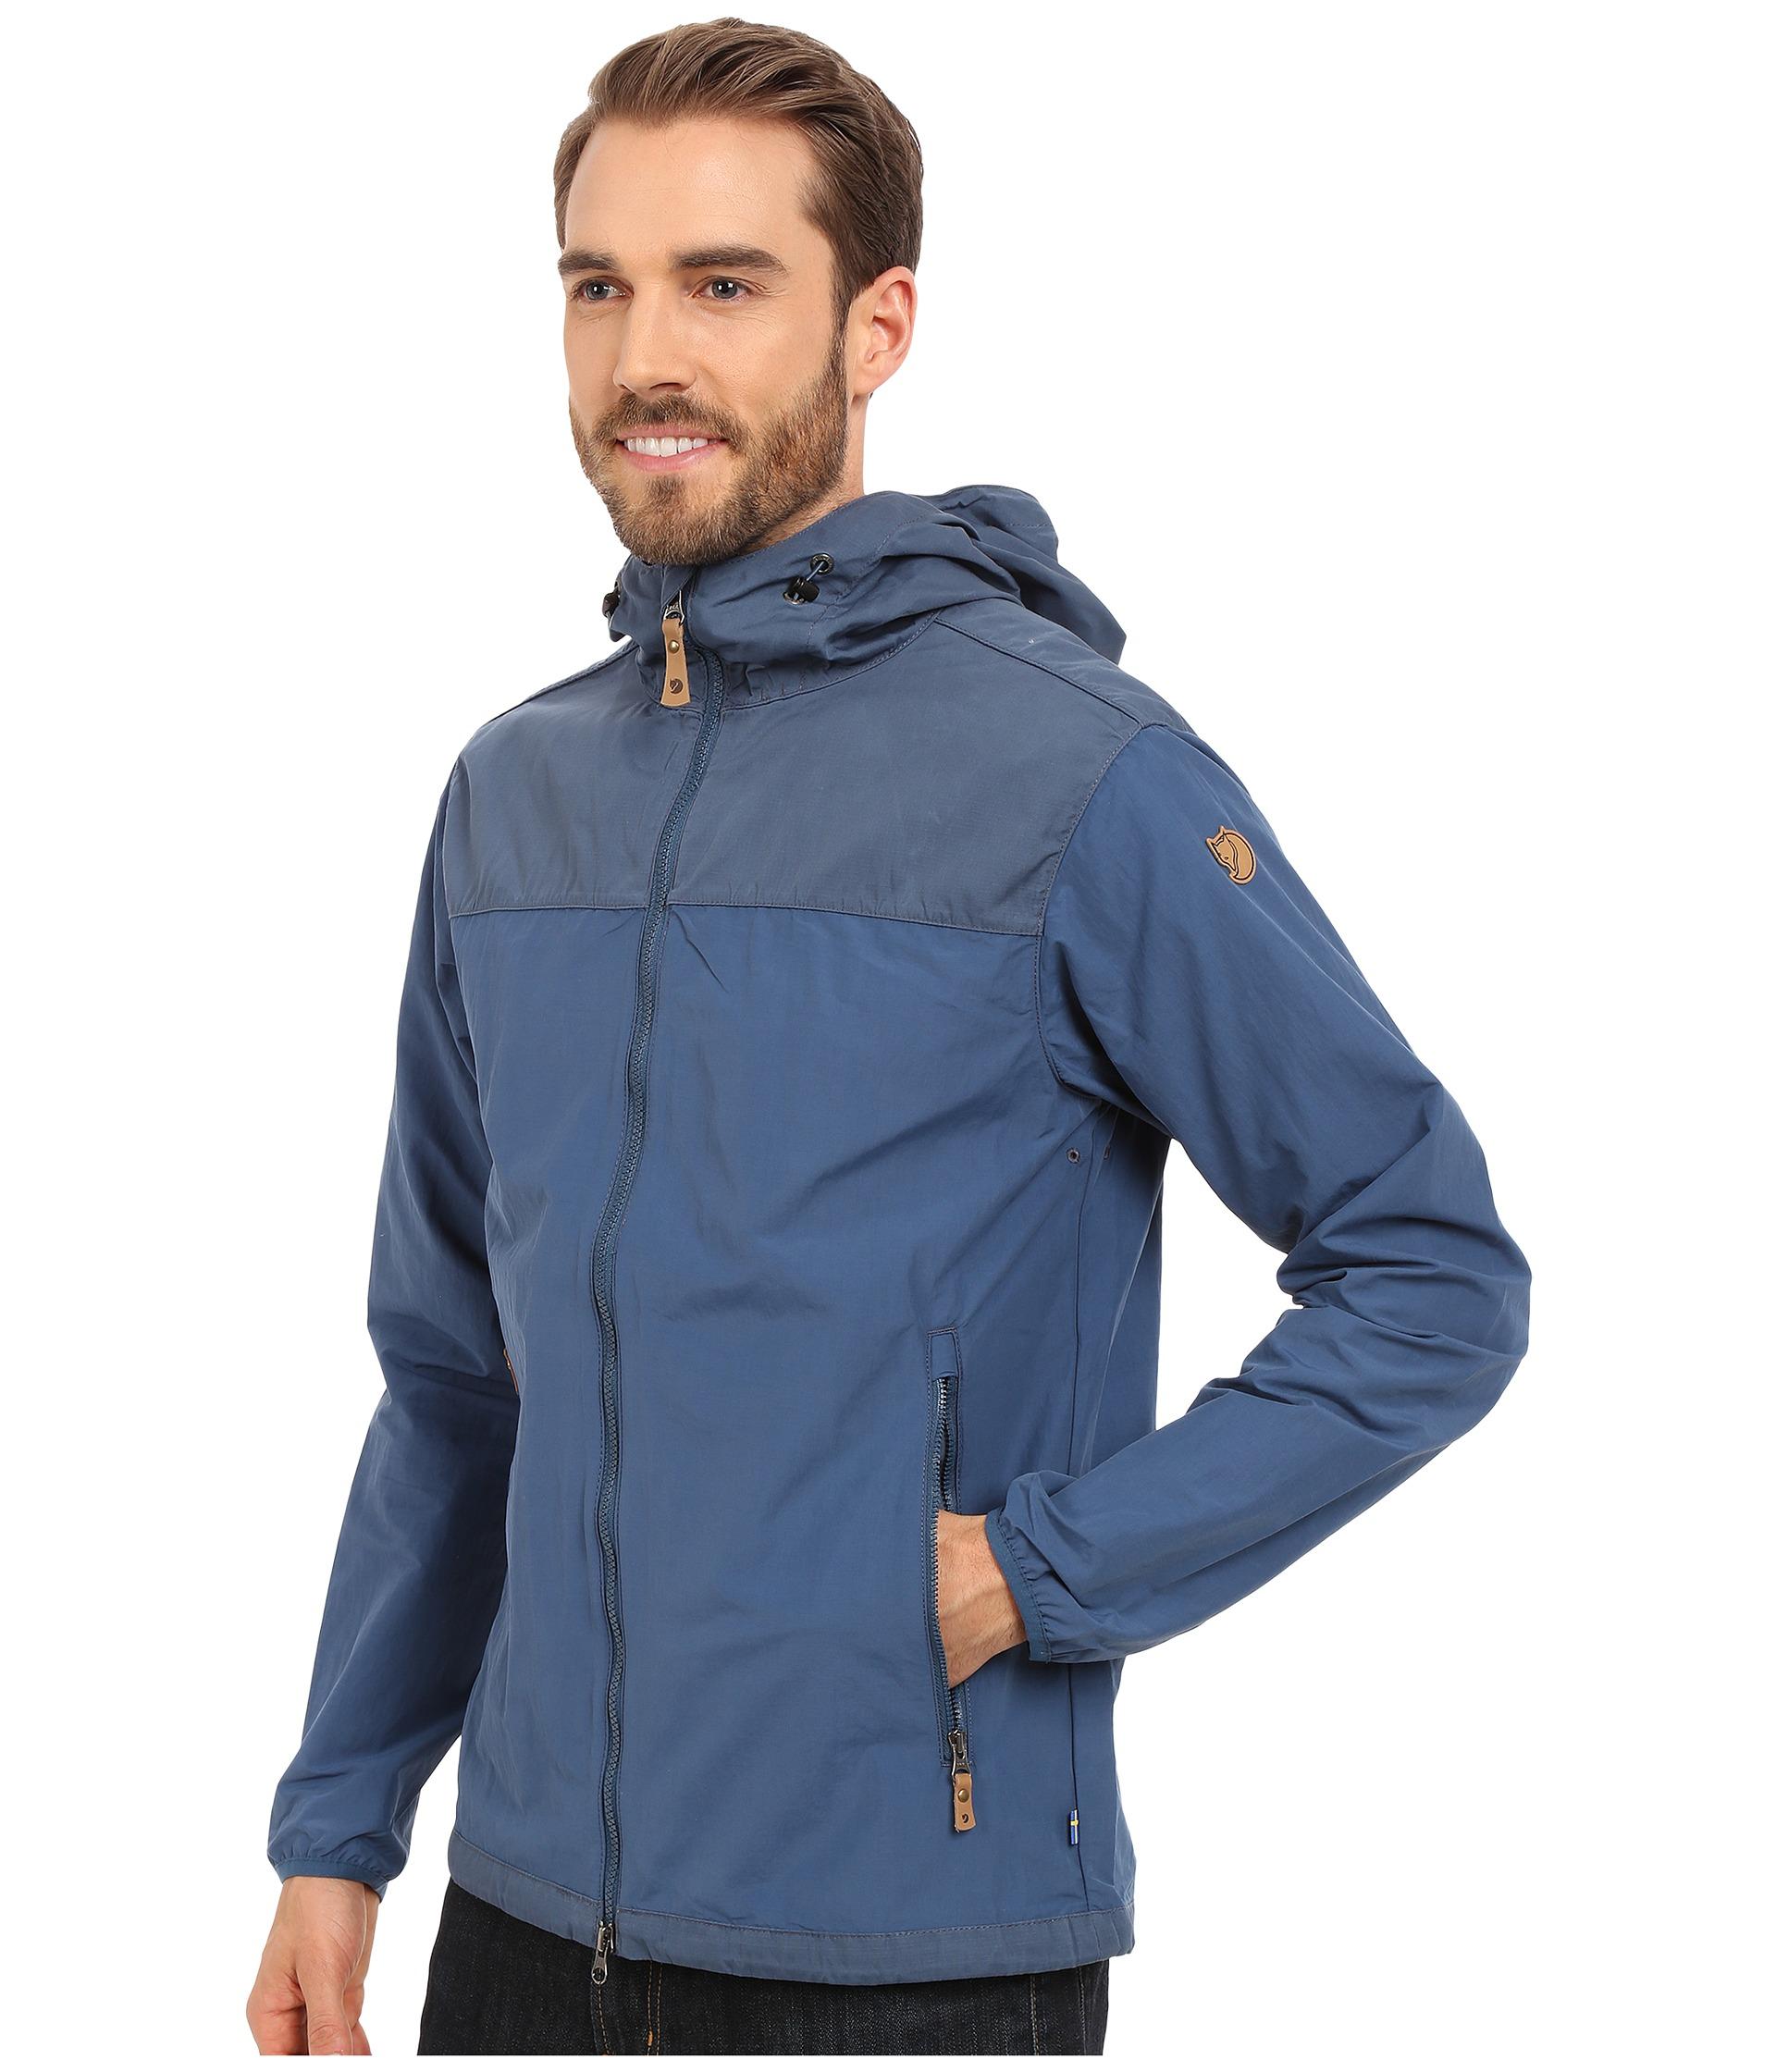 c5d41bd6c Men's Blue Abisko Hybrid Jacket